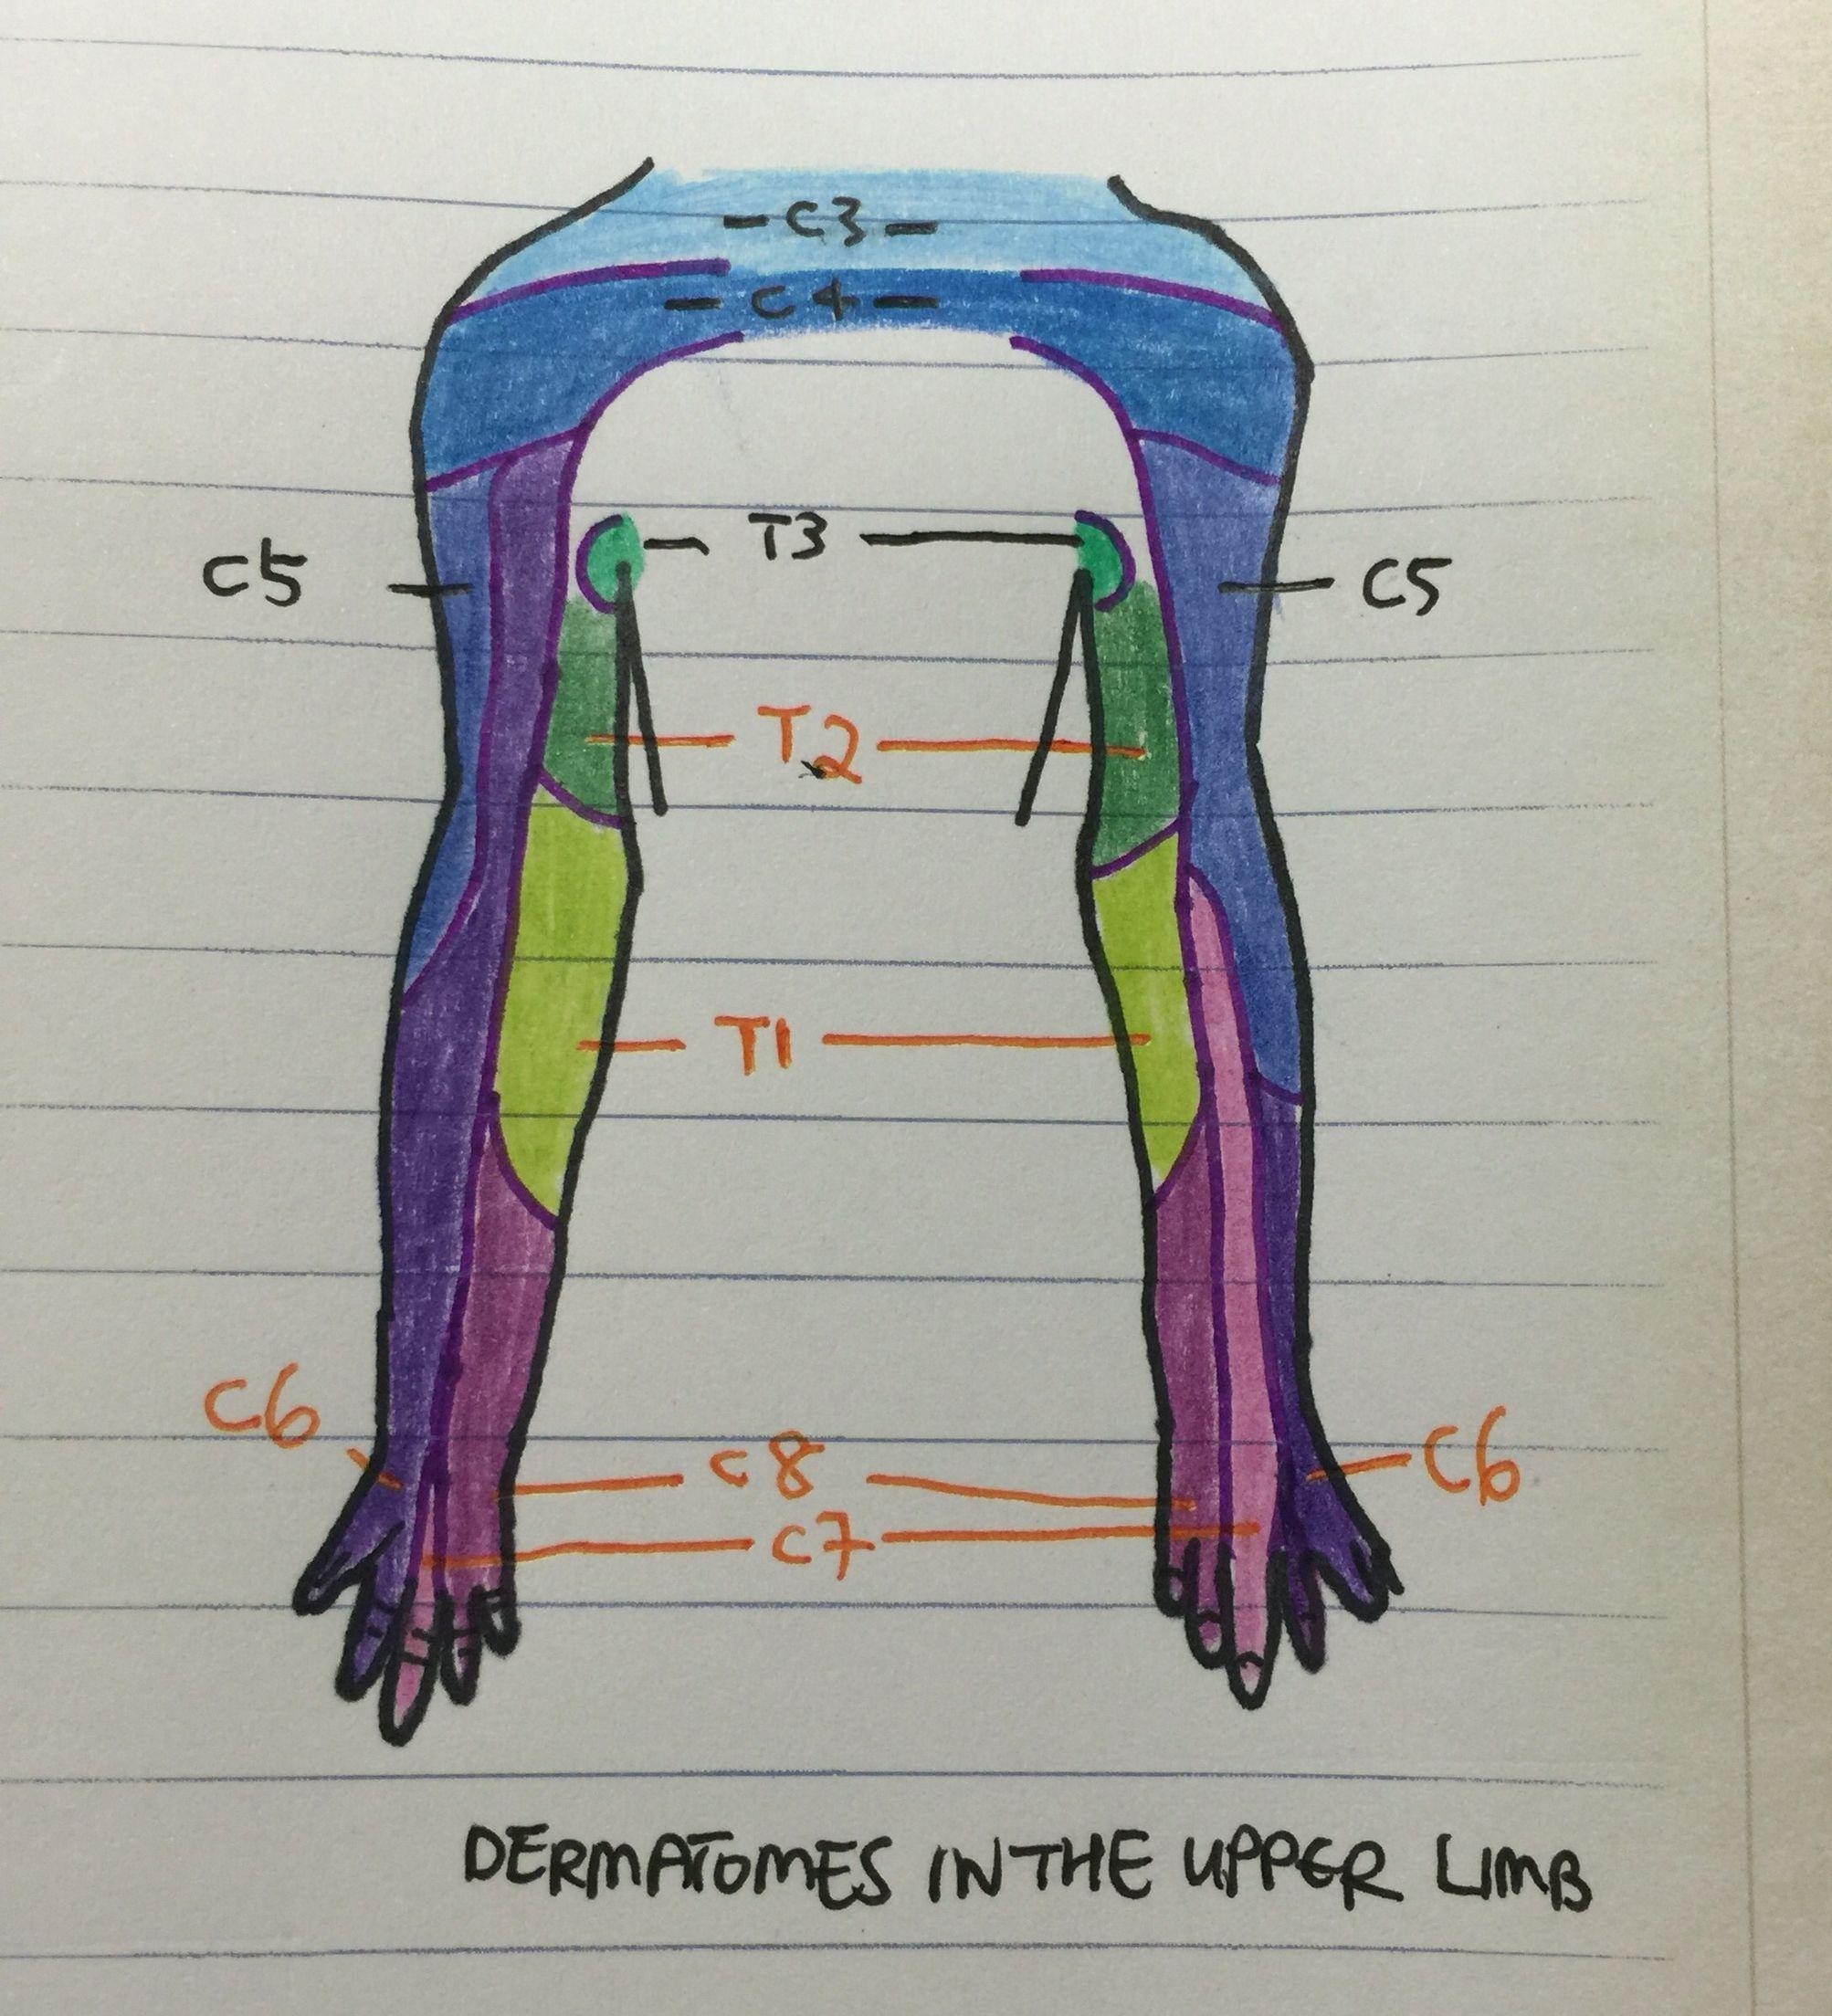 Upper limb dermatomes medicine pinterest medicine upper limb dermatomes pooptronica